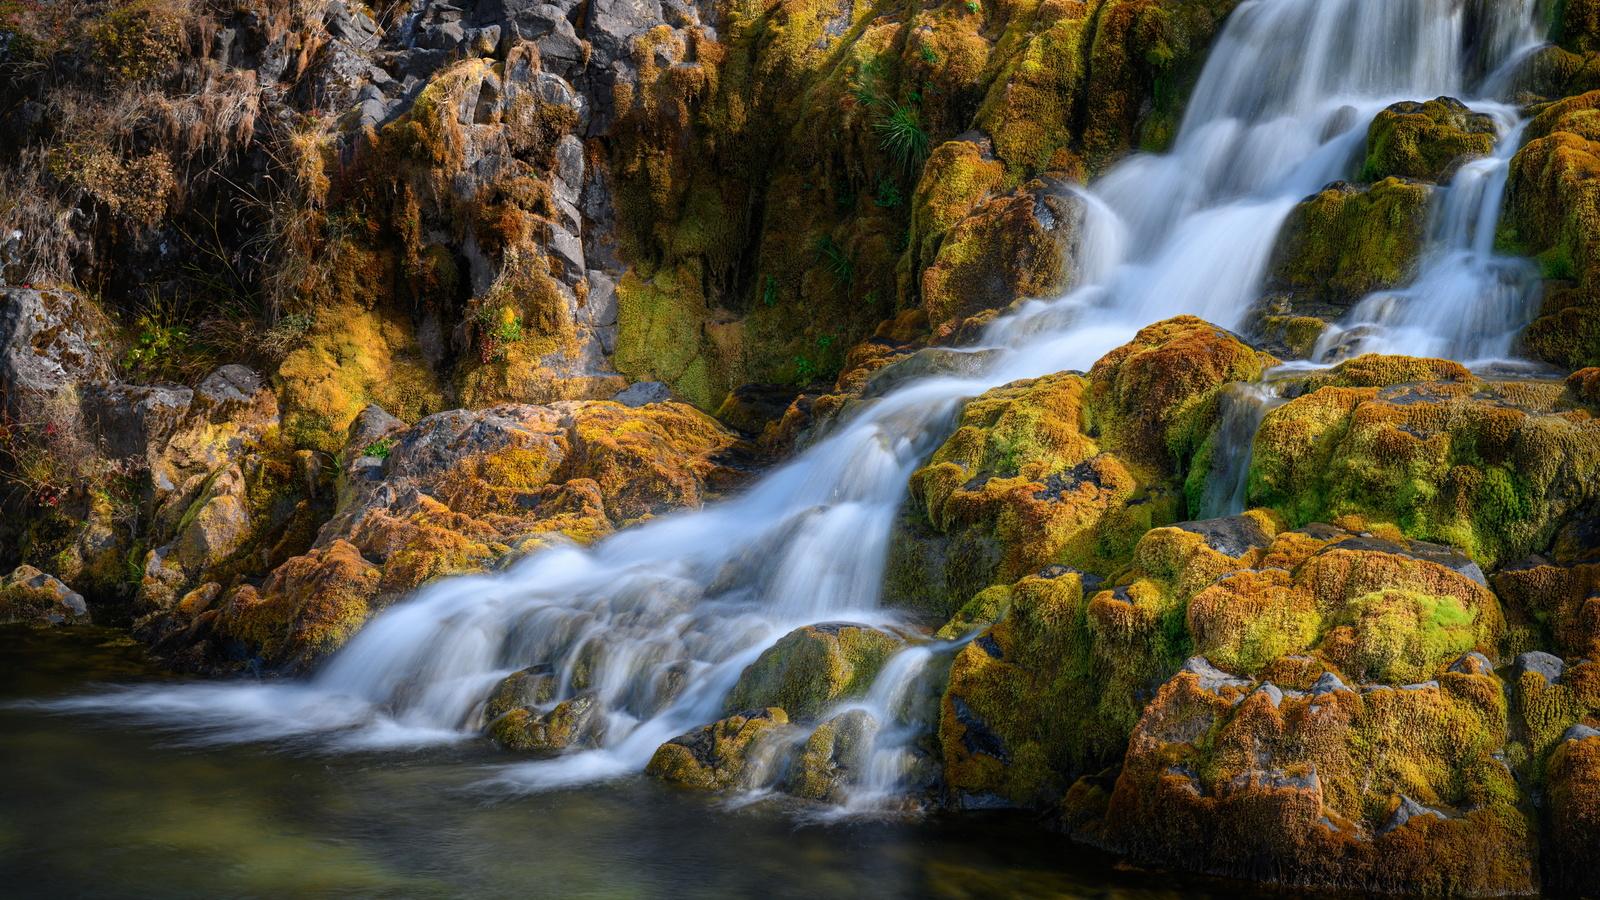 исландия, водопад, камни, реки, dynjandi waterfall, westfjords, мох, природа